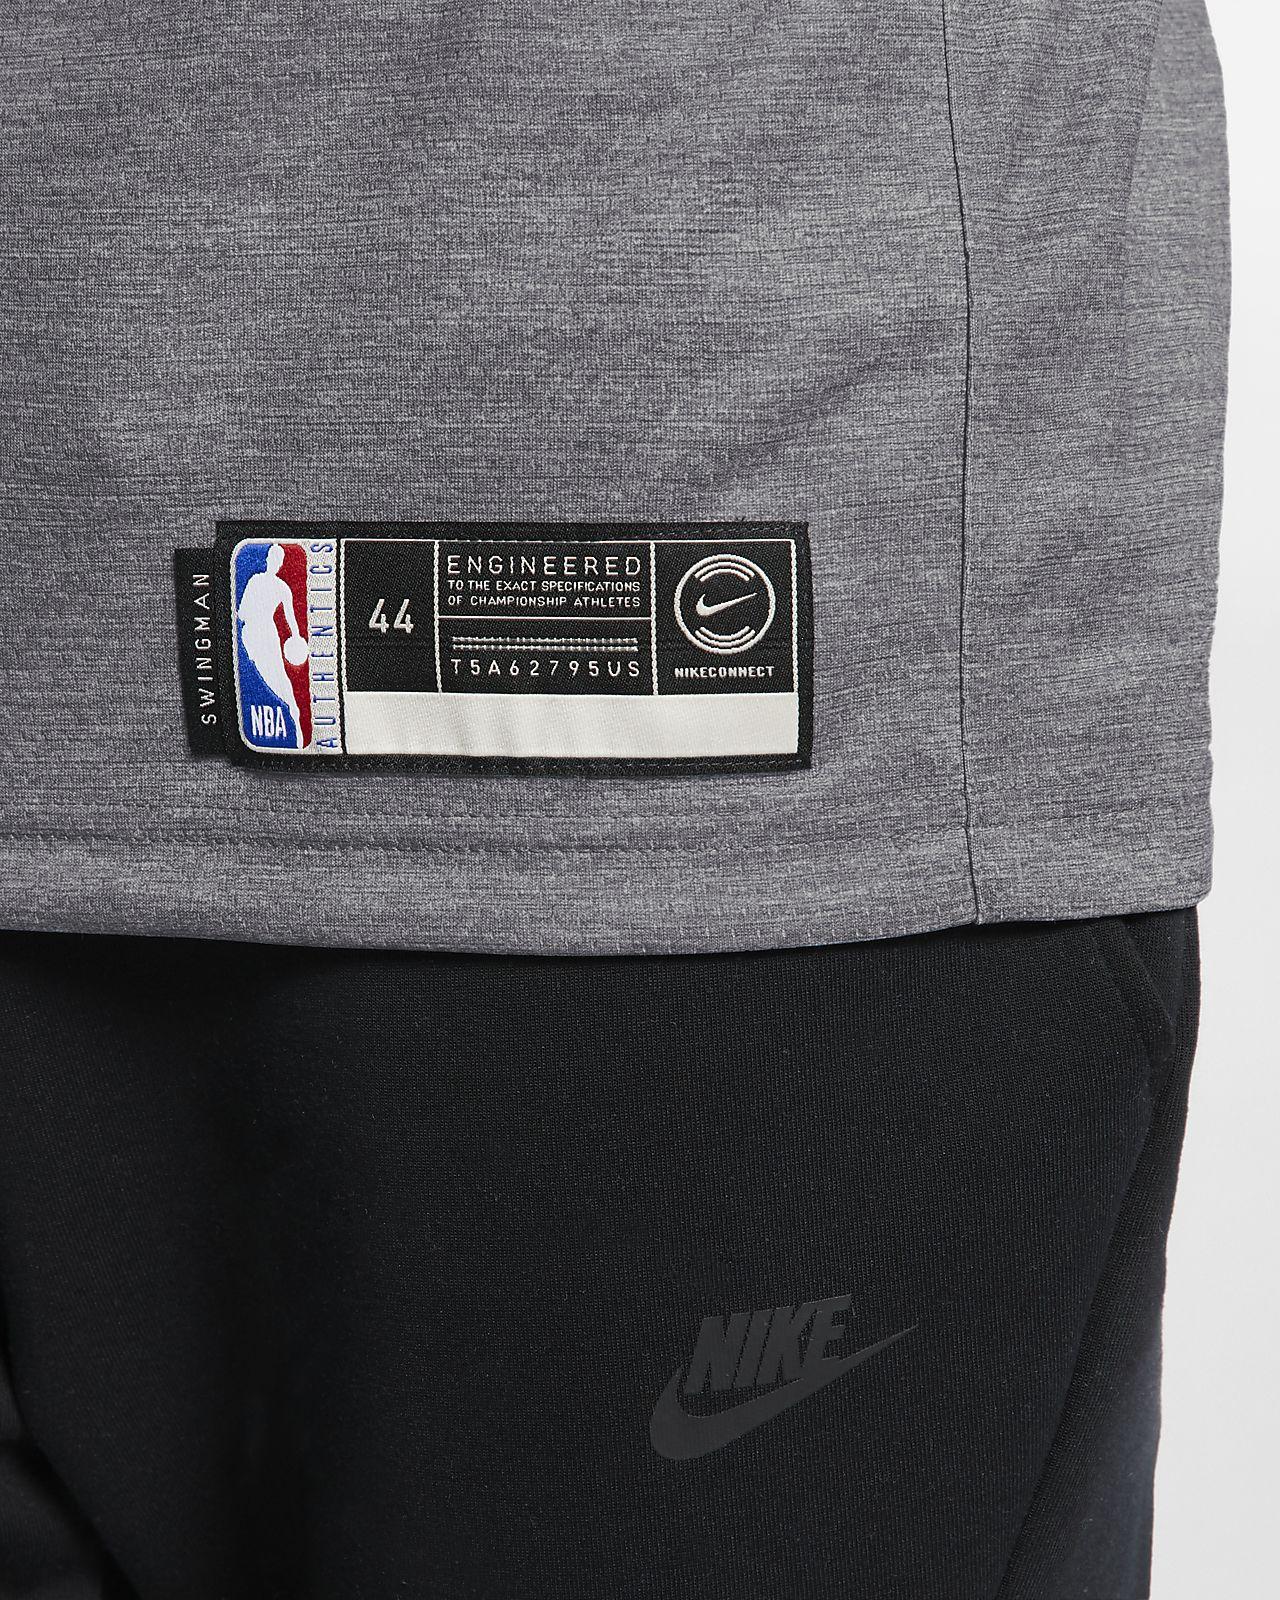 0be721930 ... Ben Simmons City Edition Swingman (Philadelphia 76ers) Men s Nike NBA  Connected Jersey